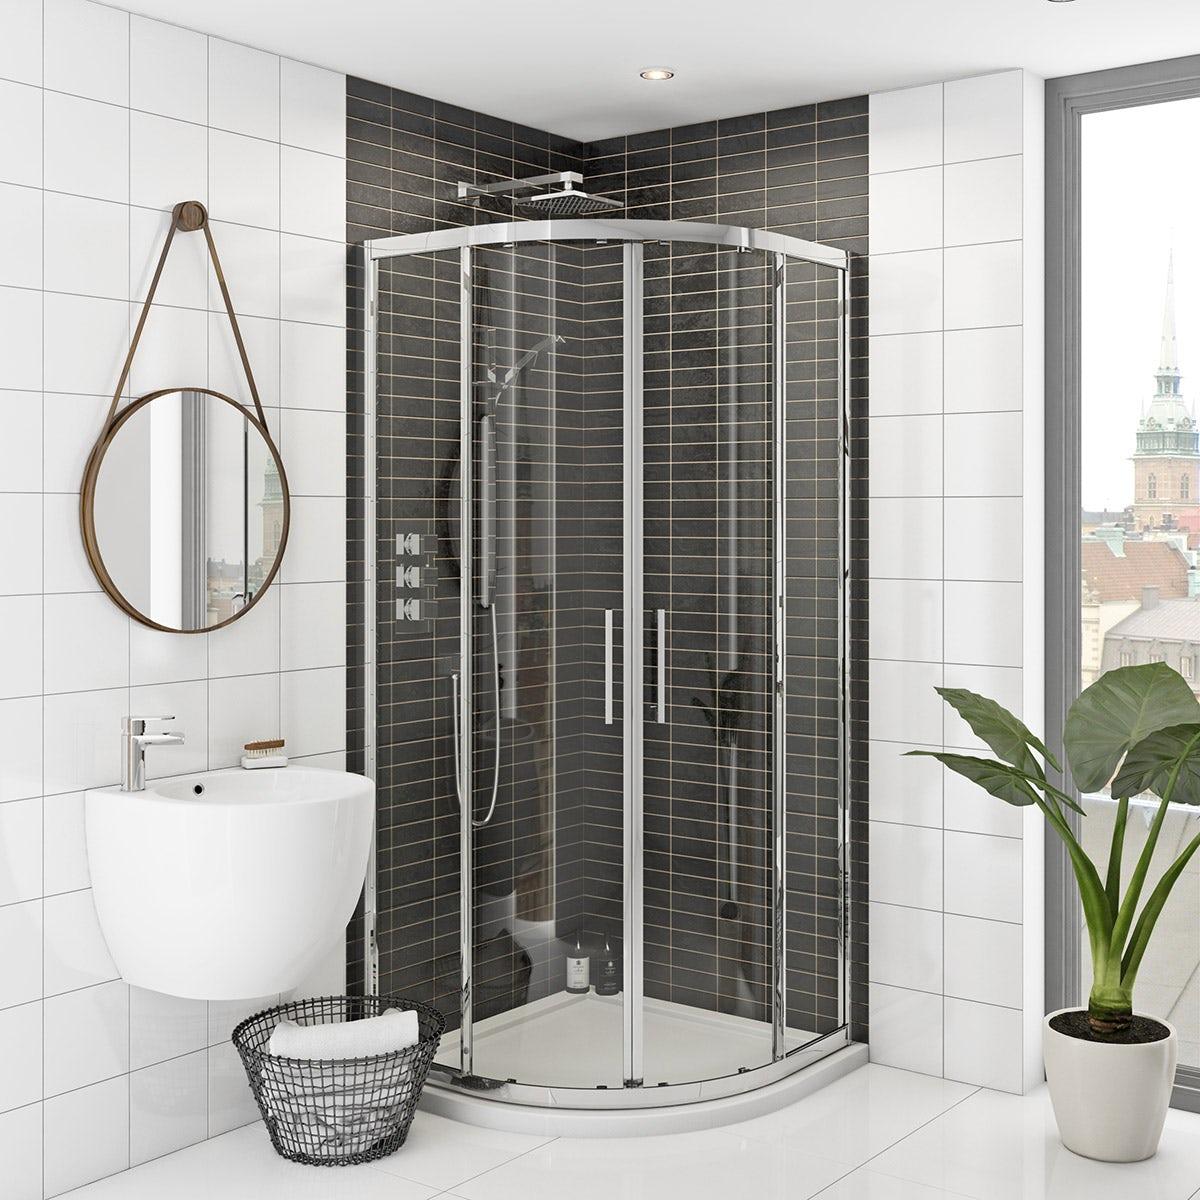 Mode rand premium 8mm easy clean quadrant shower enclosure - Small shower enclosures ...